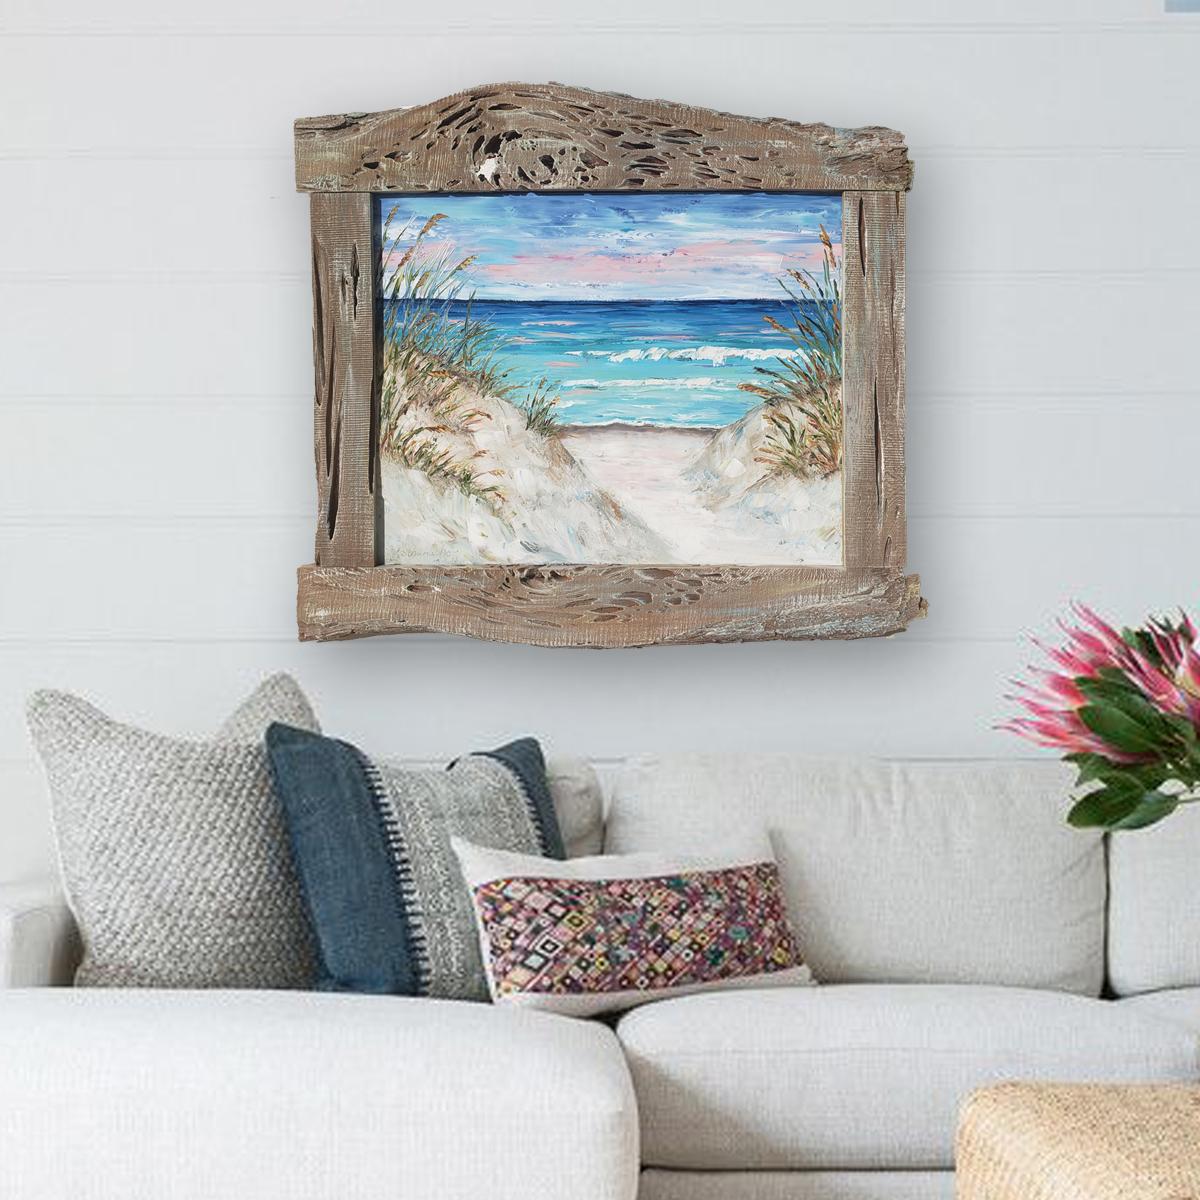 Shoreline Splendor 36×39 hung low